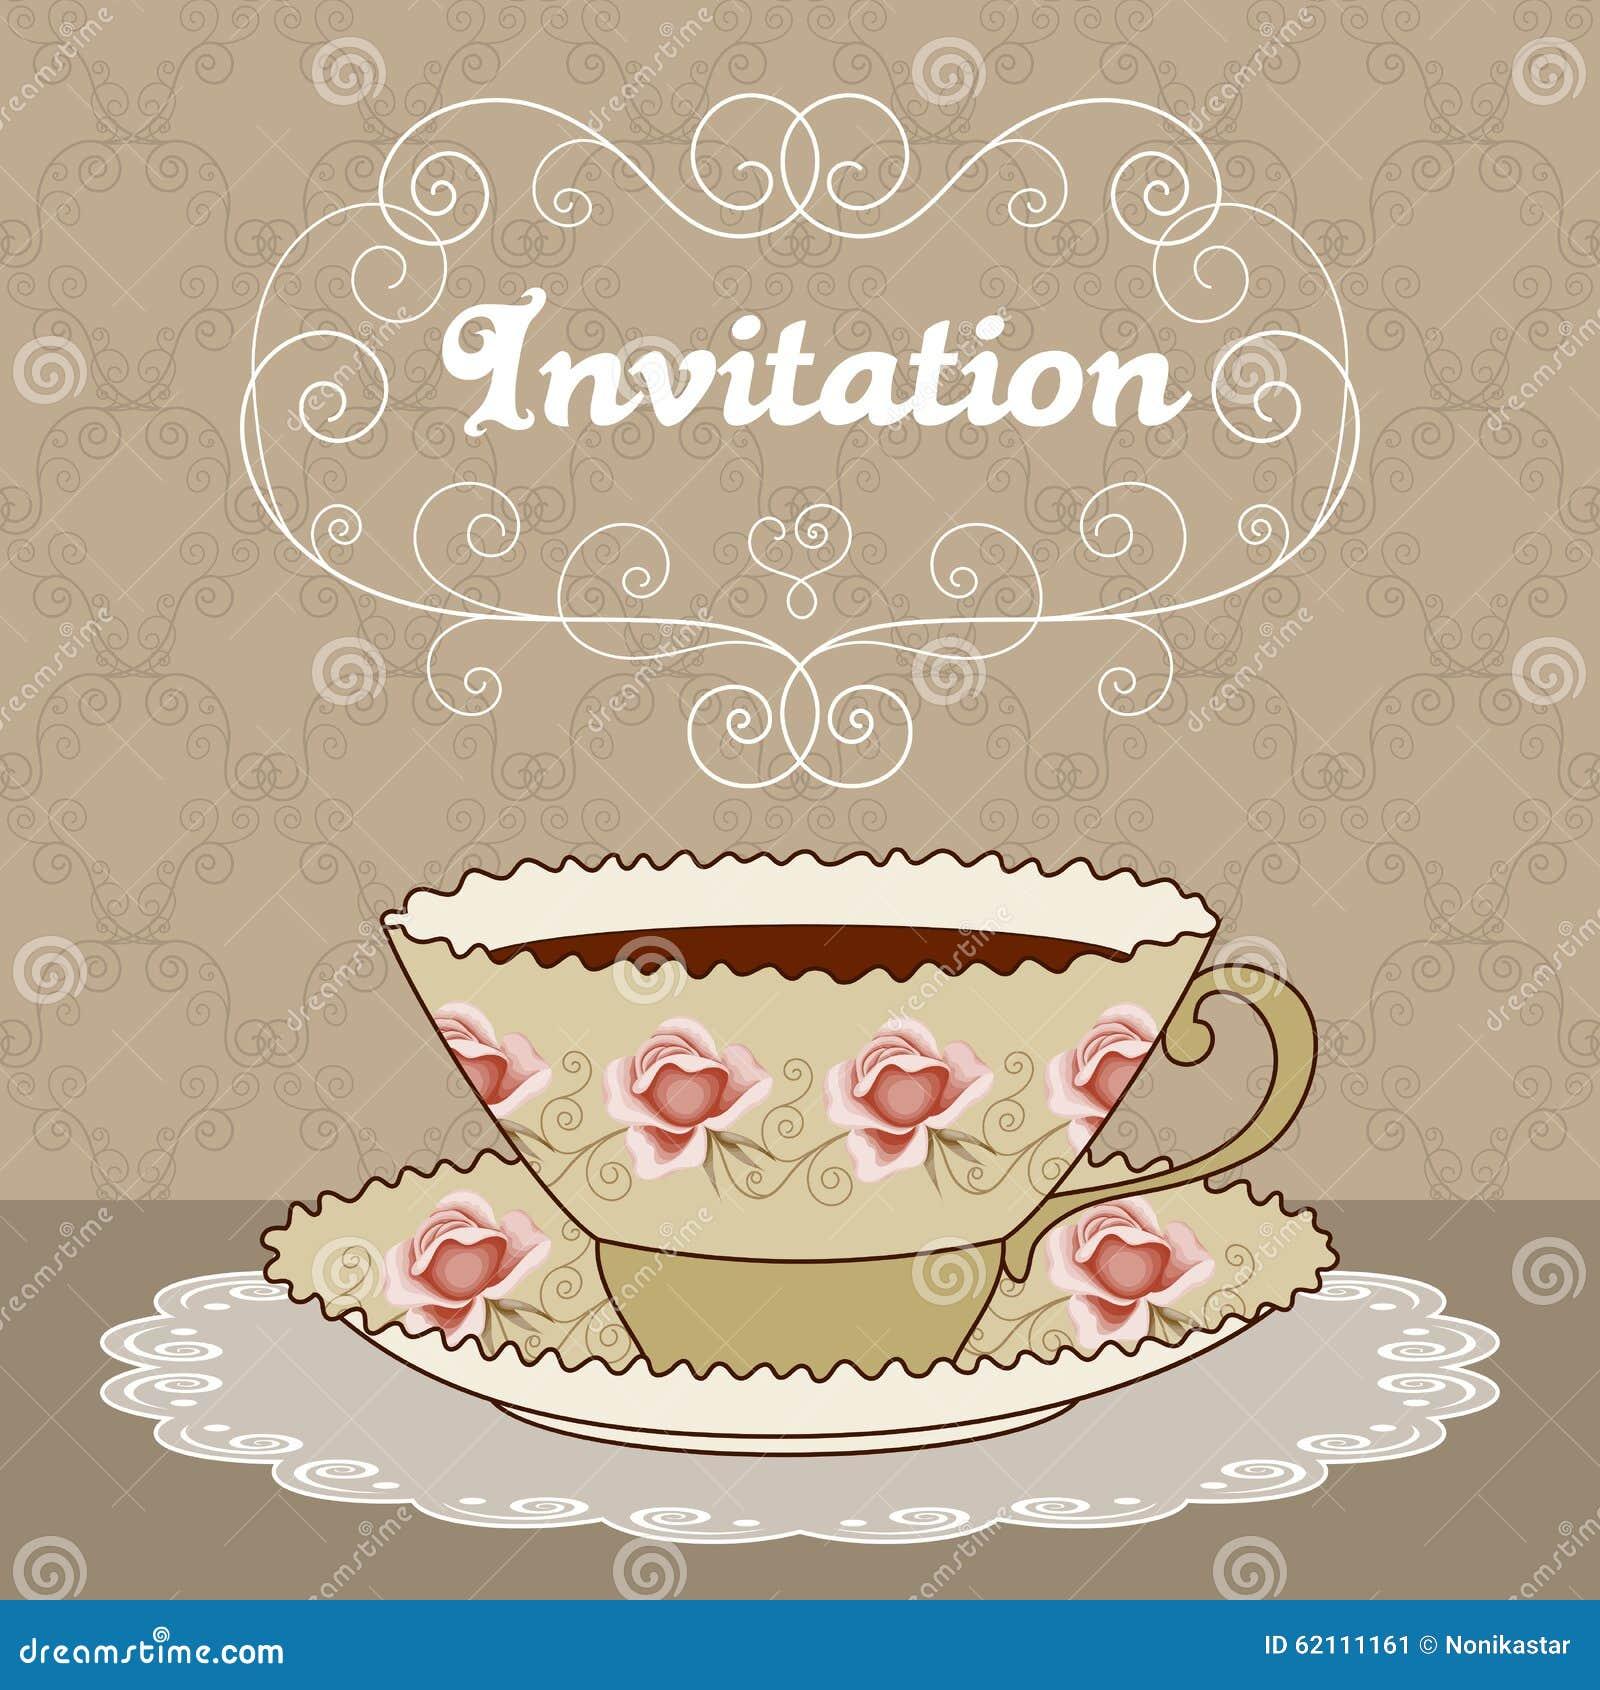 Elegant tea party invitation template with teacups cartoon vector - Tea Party Card Stock Image